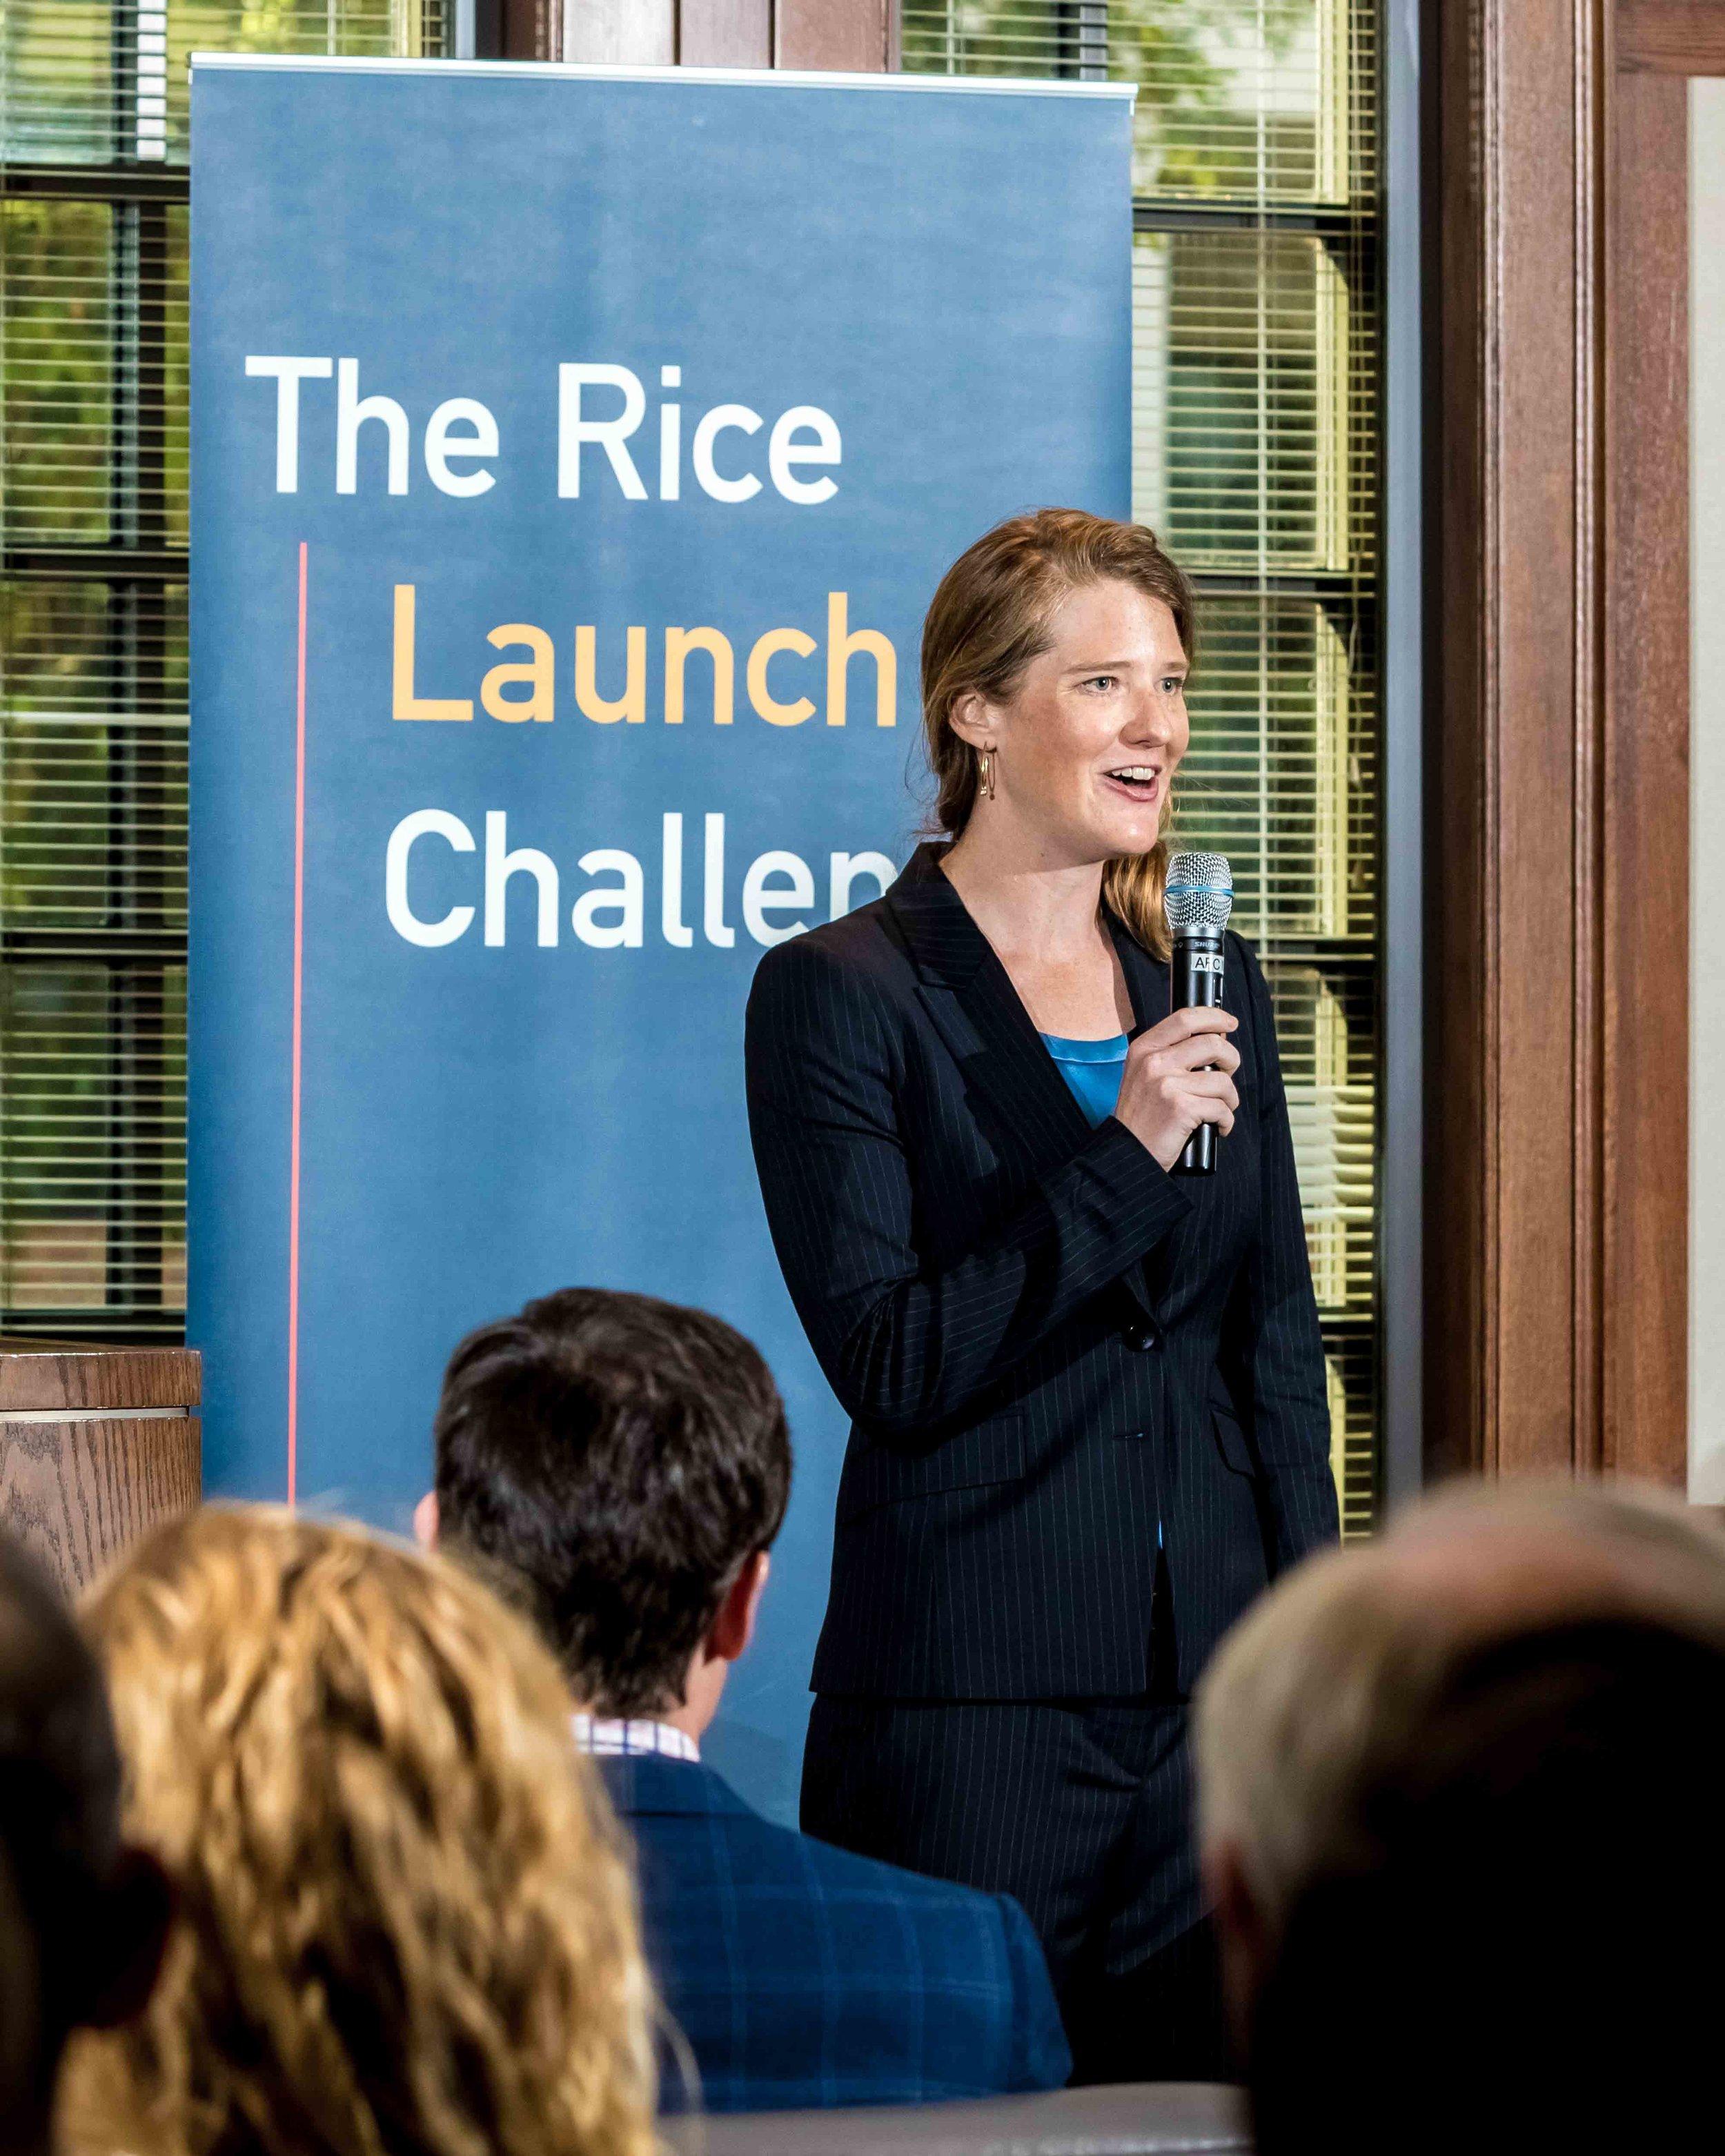 Rice University - Launch Challenge 29Mar2017-21Rice University - Launch Challenge 29Mar2017.JPG